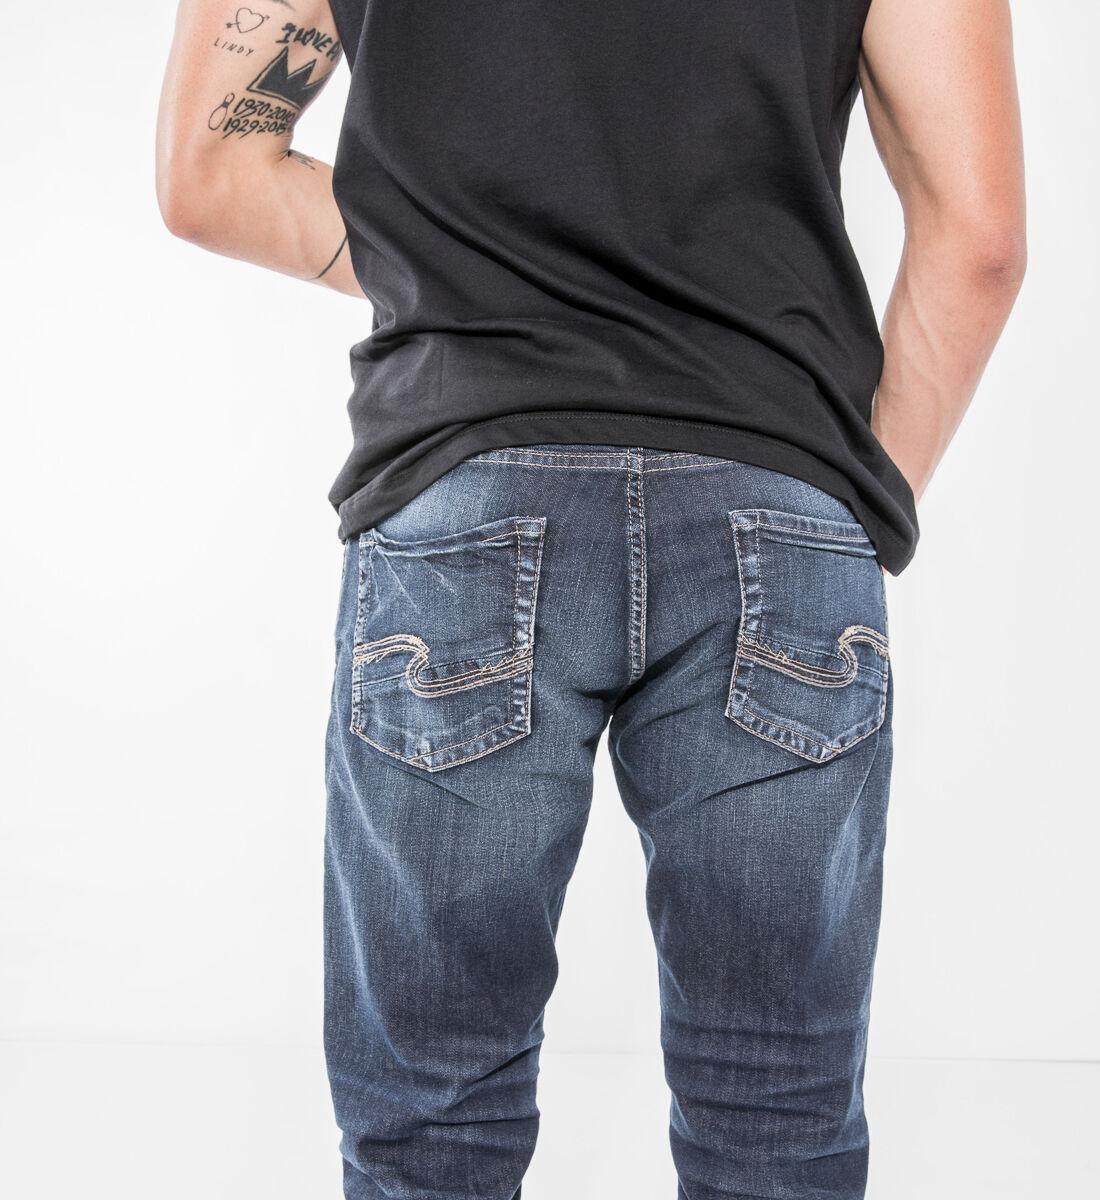 Allan Classic Fit Straight Leg Jeans Alt Image 1